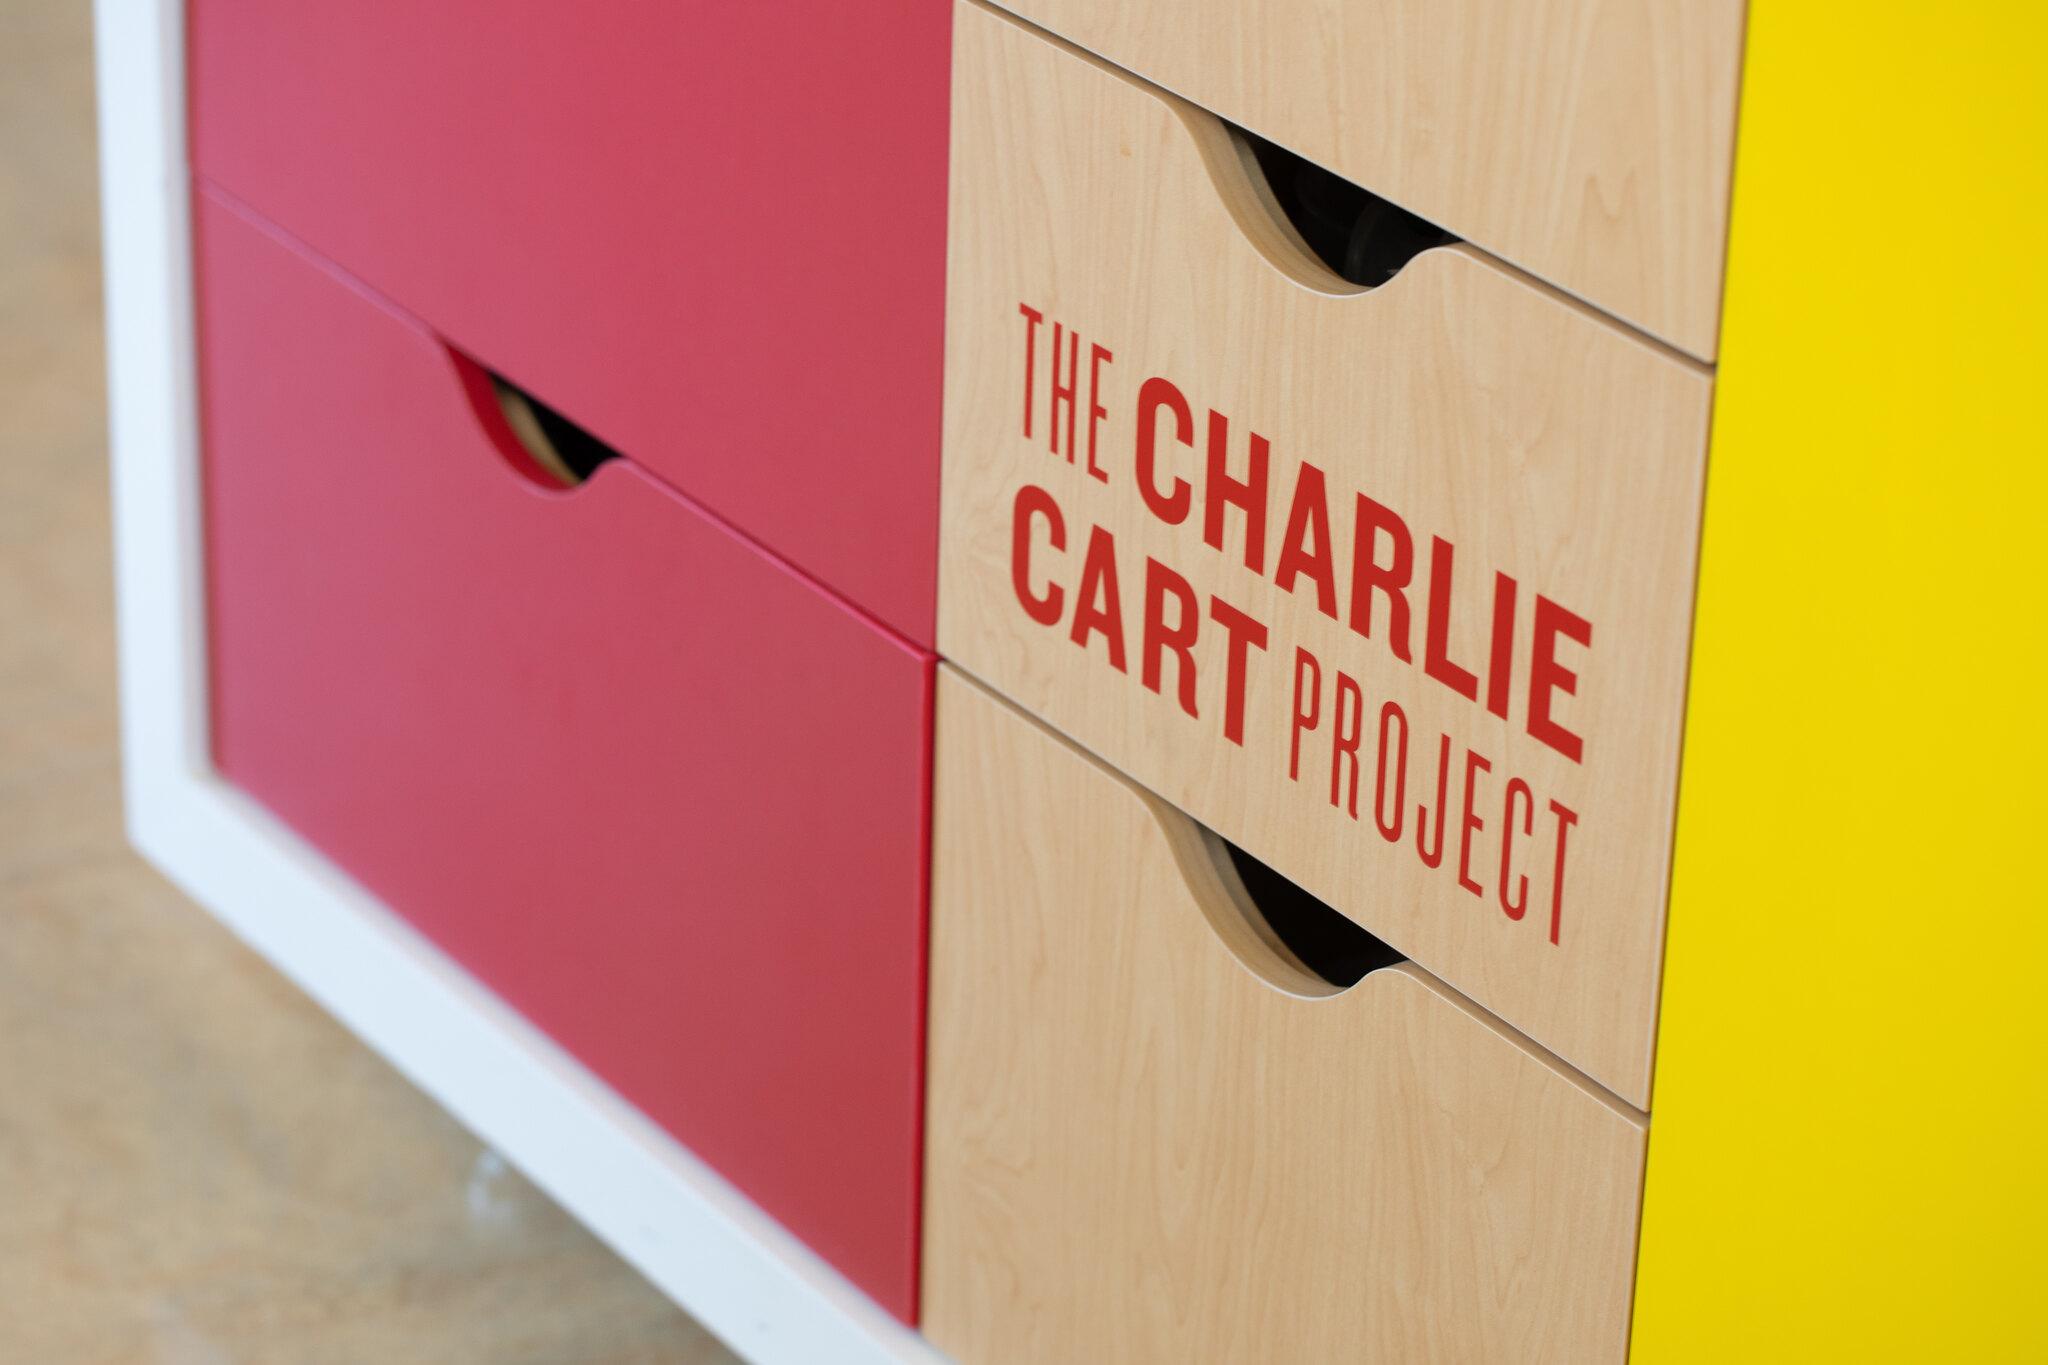 Charlie Cart close up